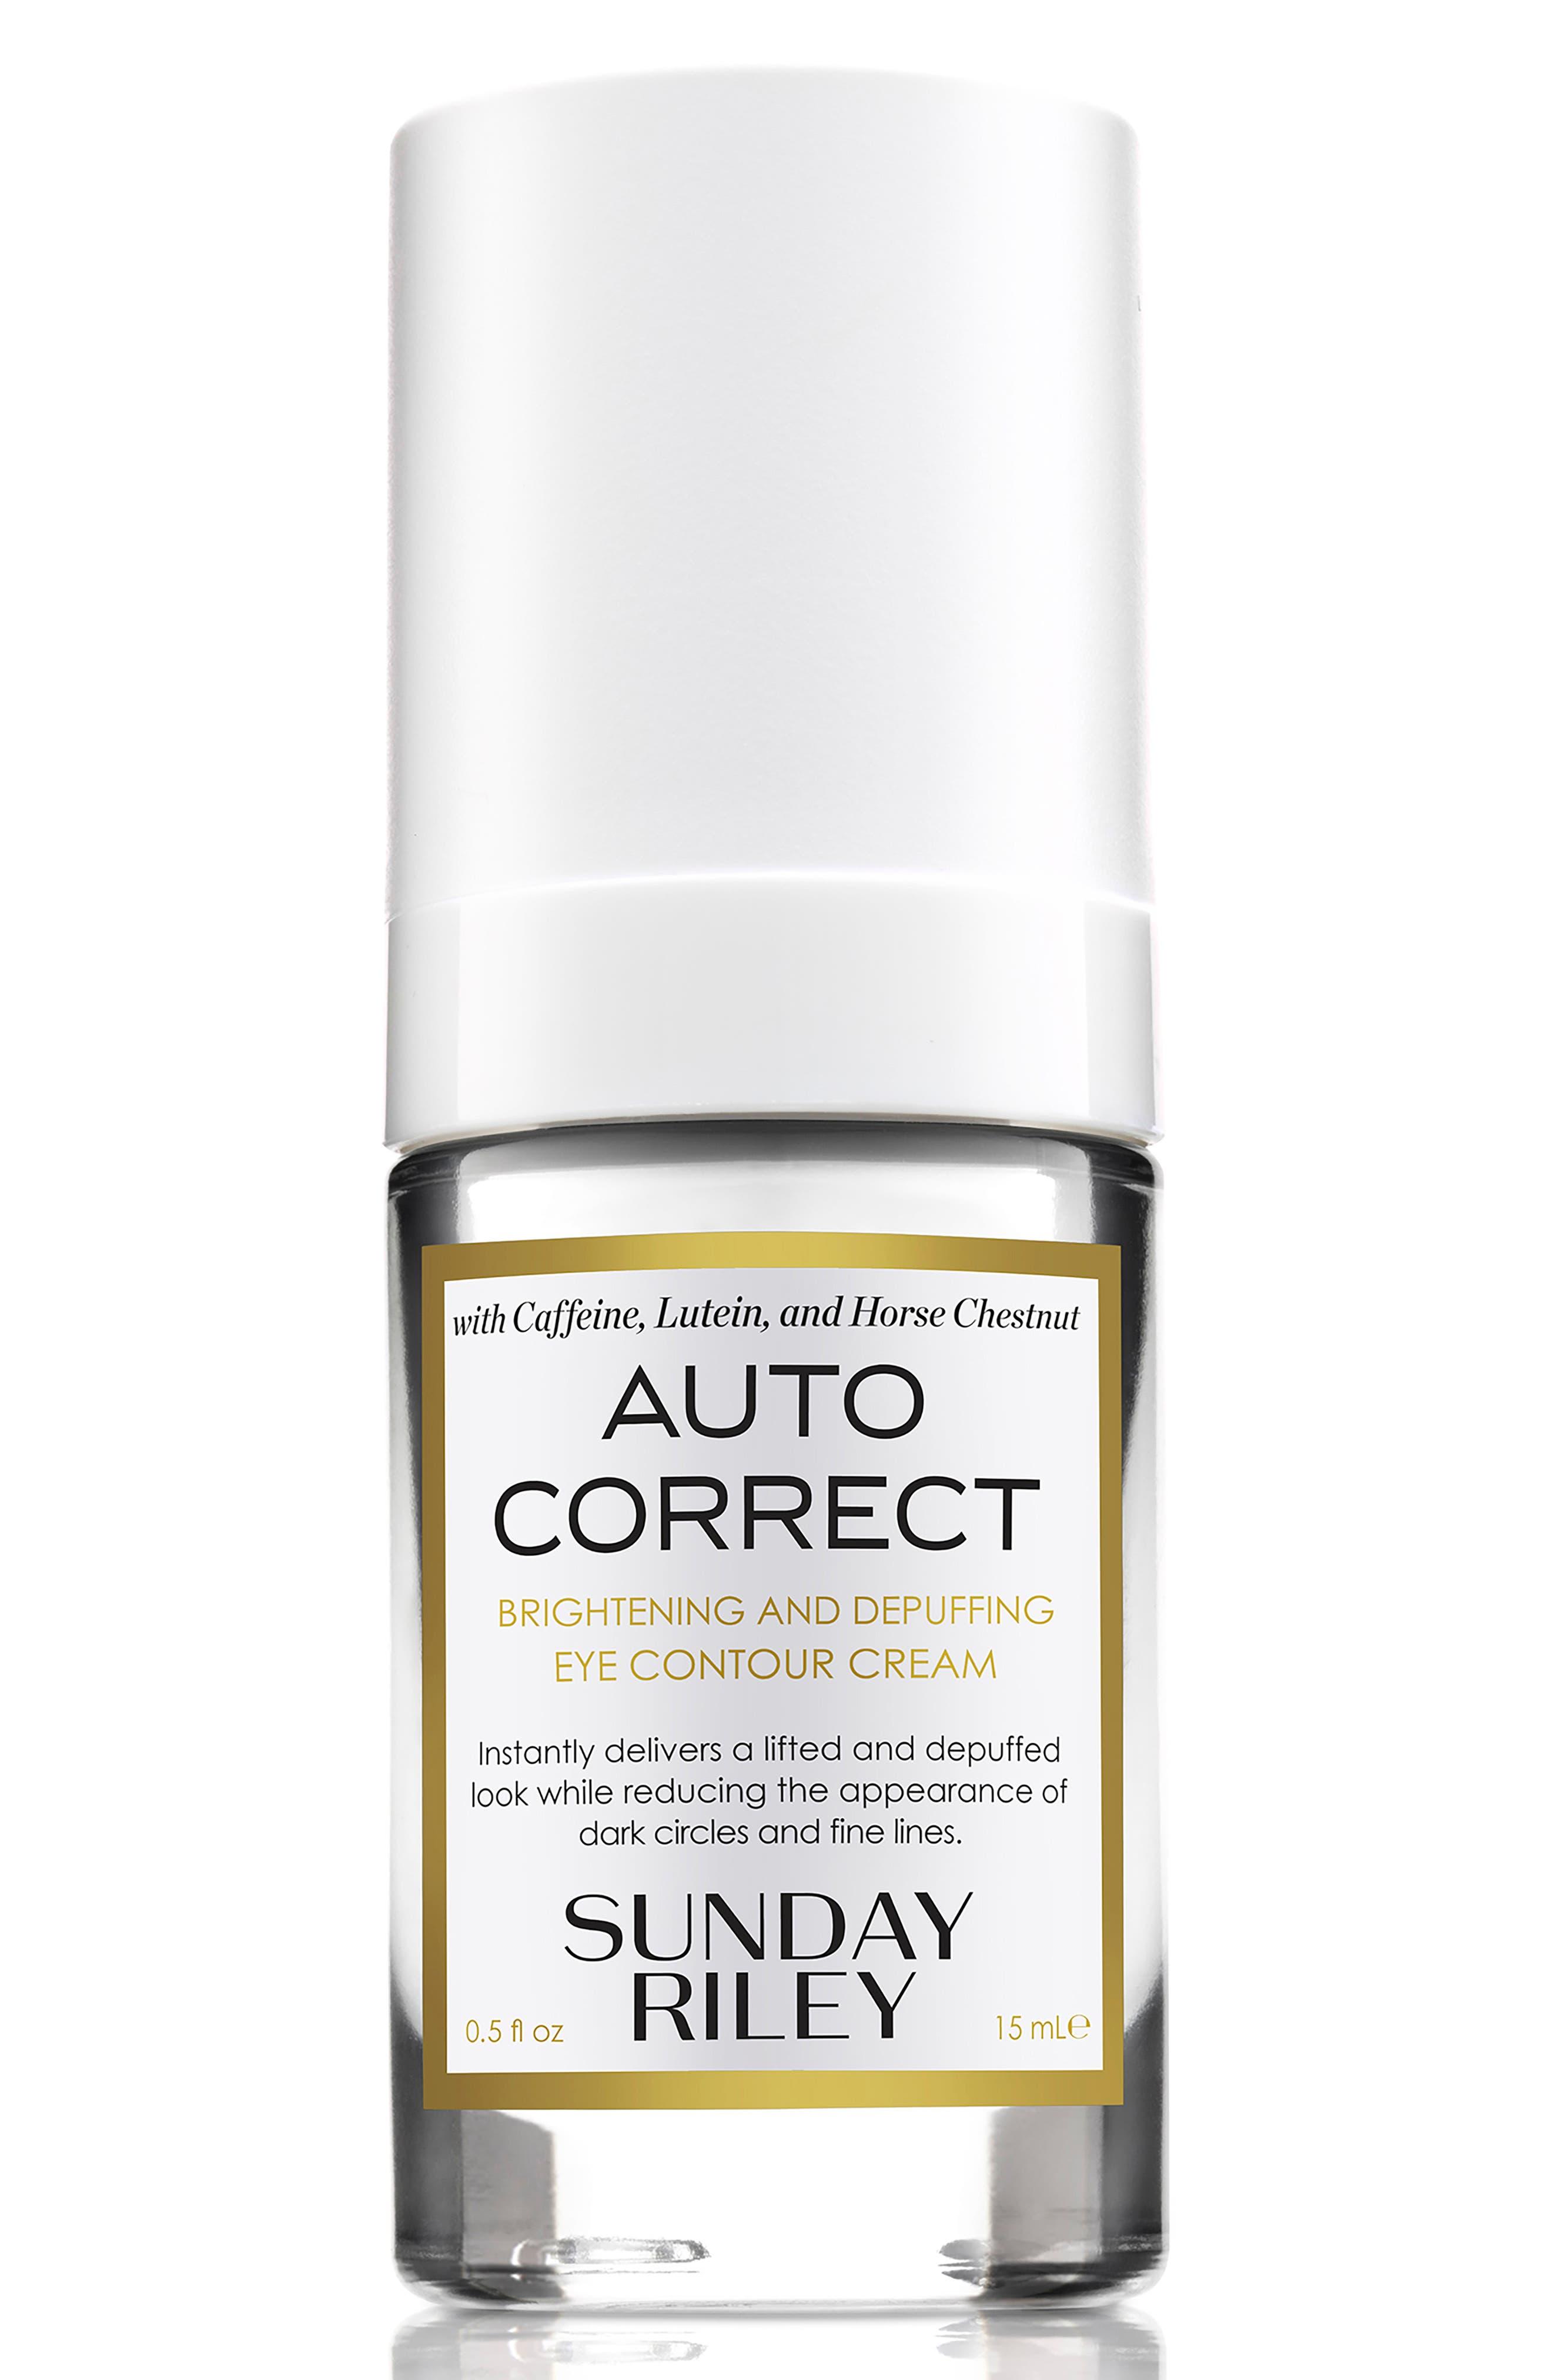 Sunday Riley Autocorrect Brightening and Depuffing Eye Contour Cream